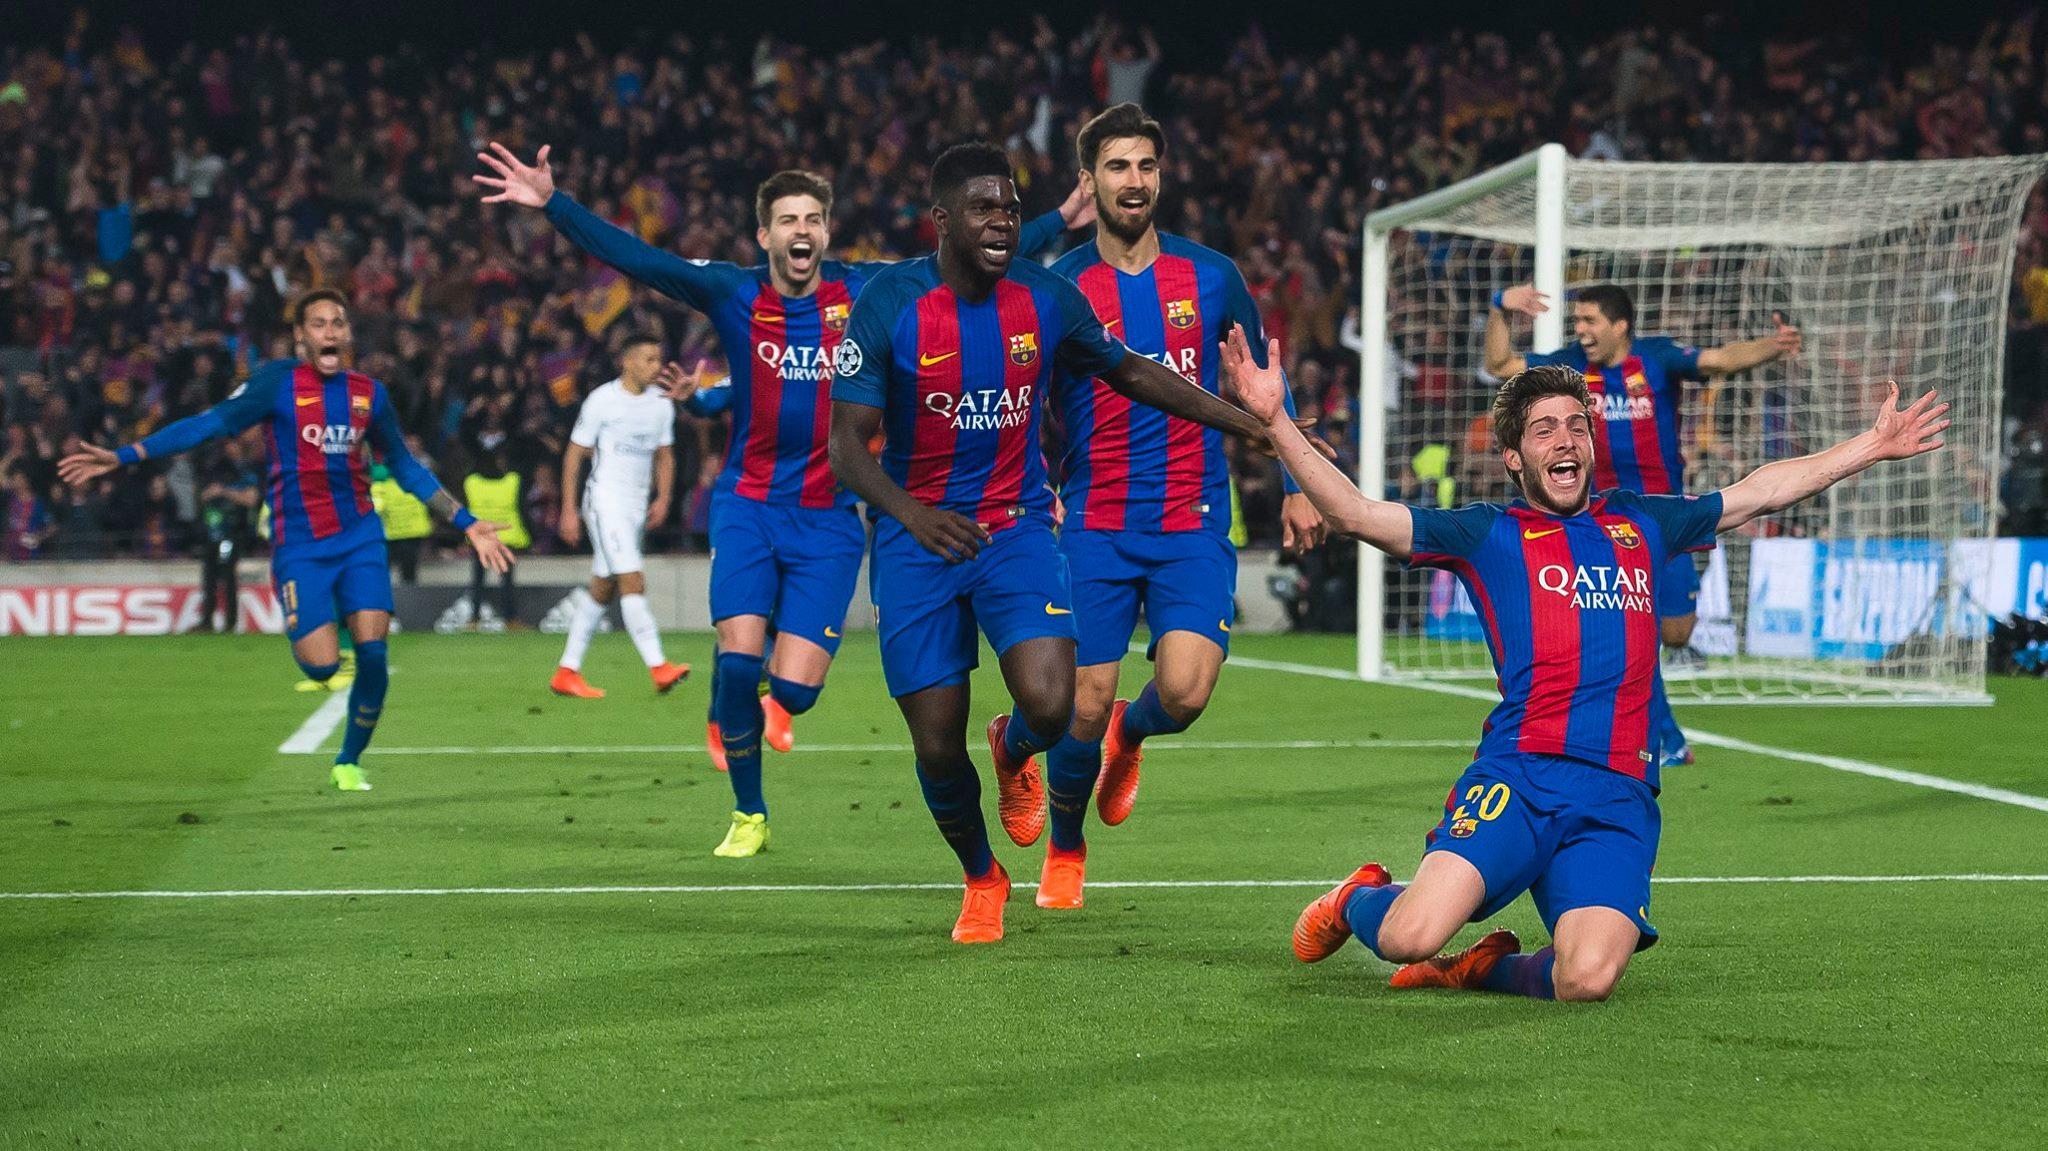 Best comeback ever for Barcelona